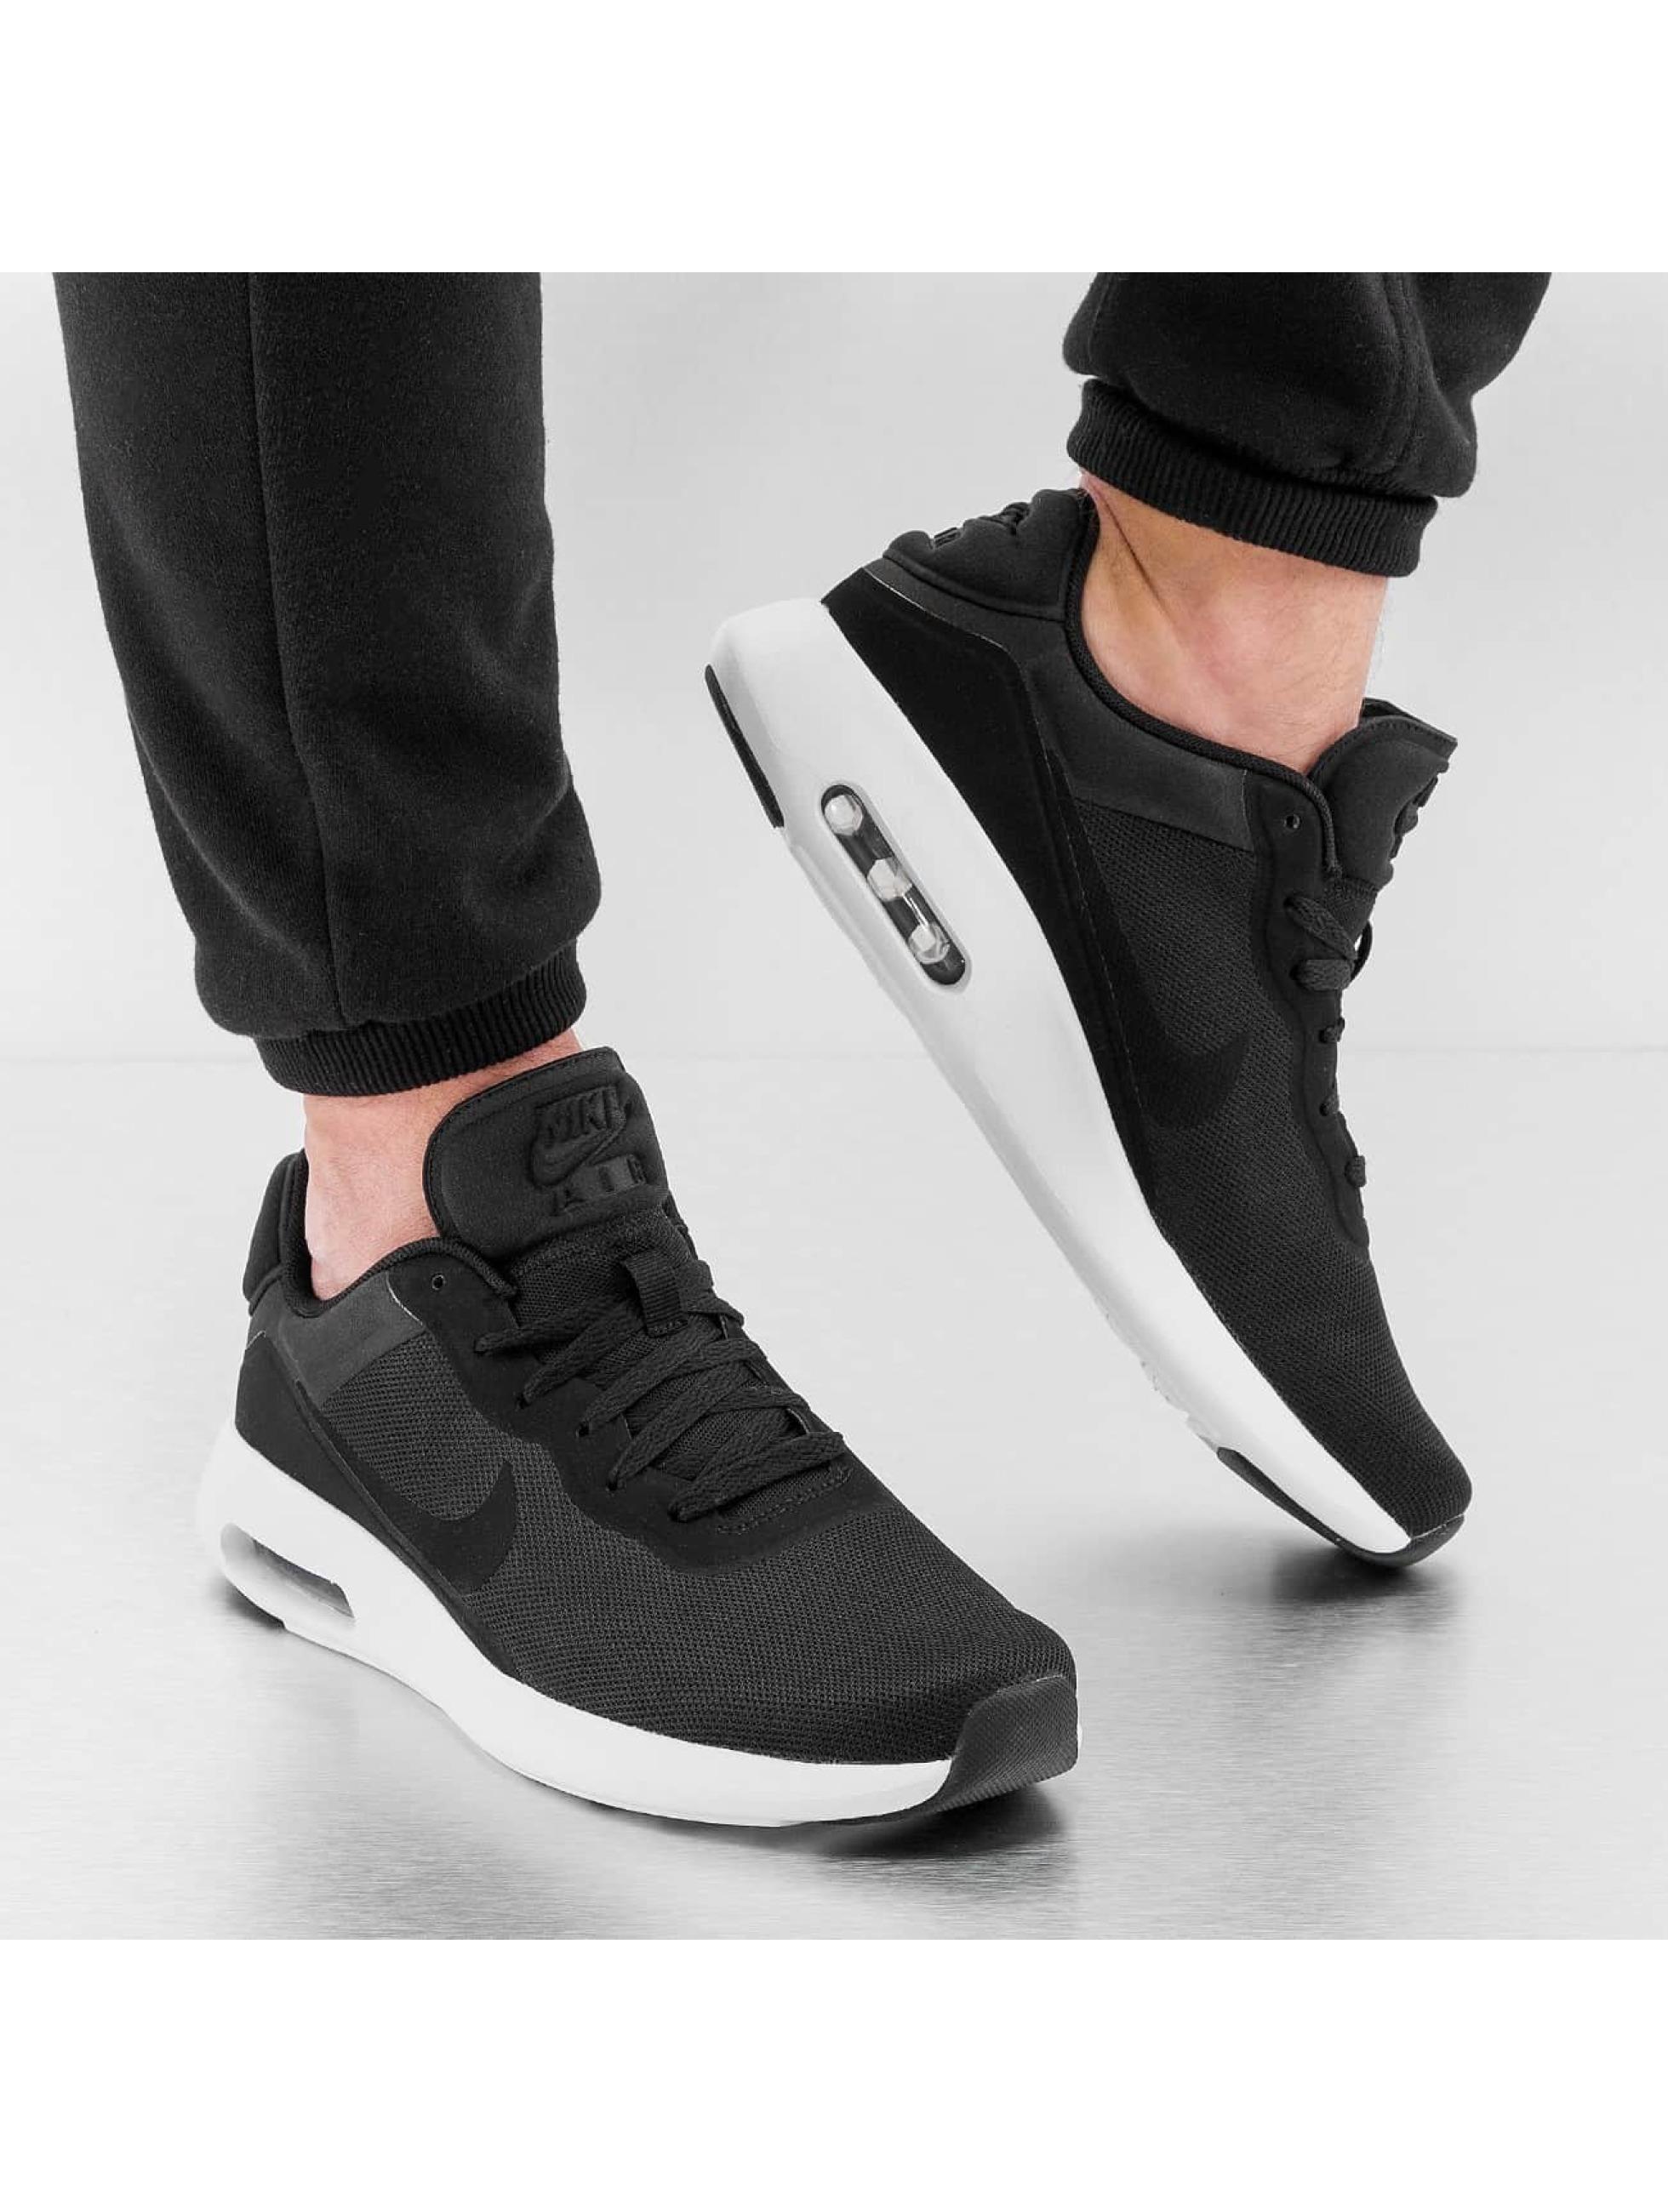 nike roshe run print speckle - Nike Chaussures / Baskets Air Max Modern Essential en noir 257142